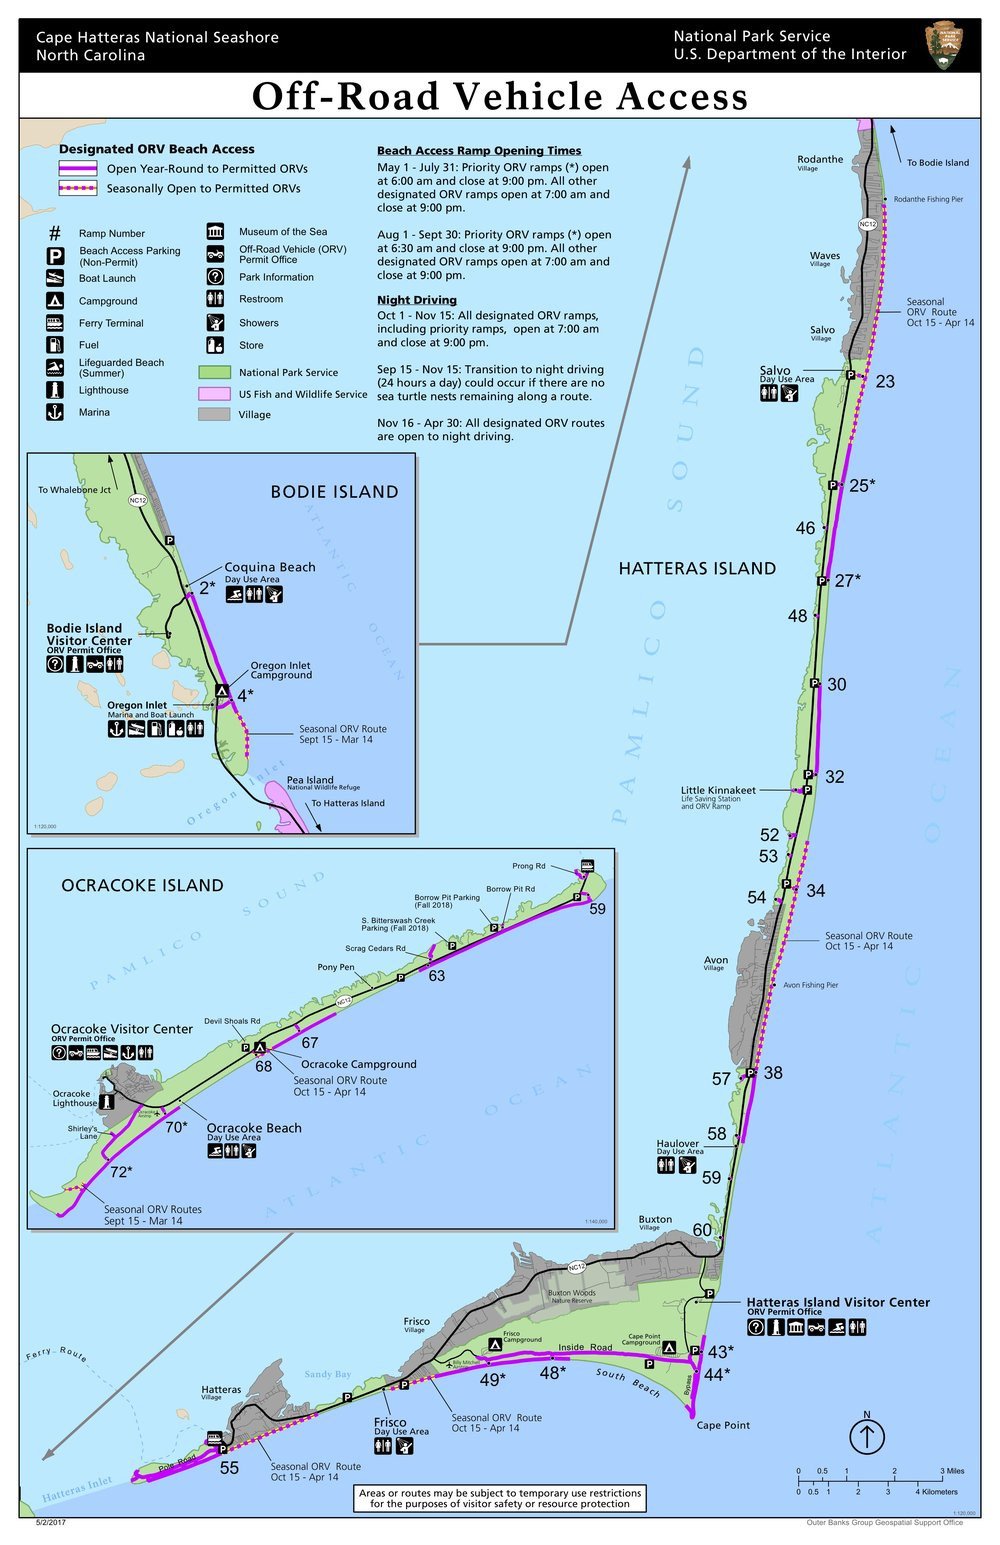 Designated beach access areas across Cape Hatteras National Seashore - National Park Service